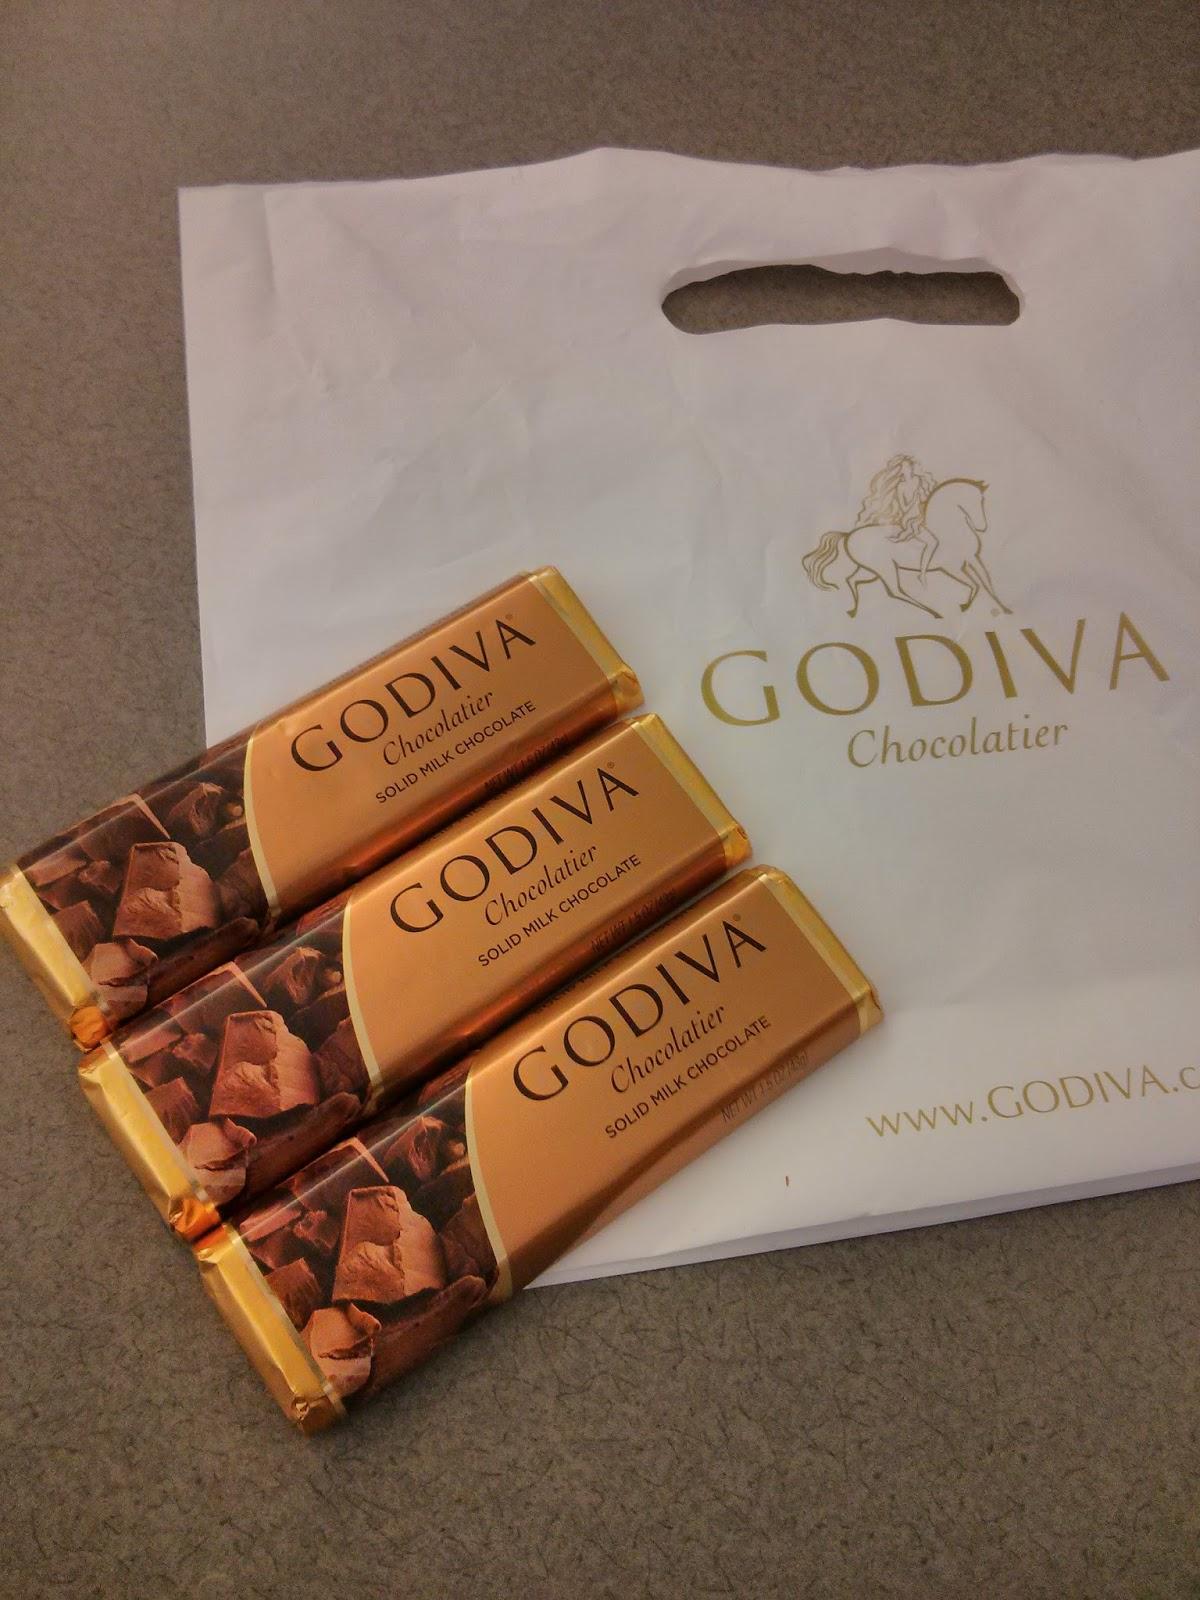 Godiva Free Chocolate Of The Month Club